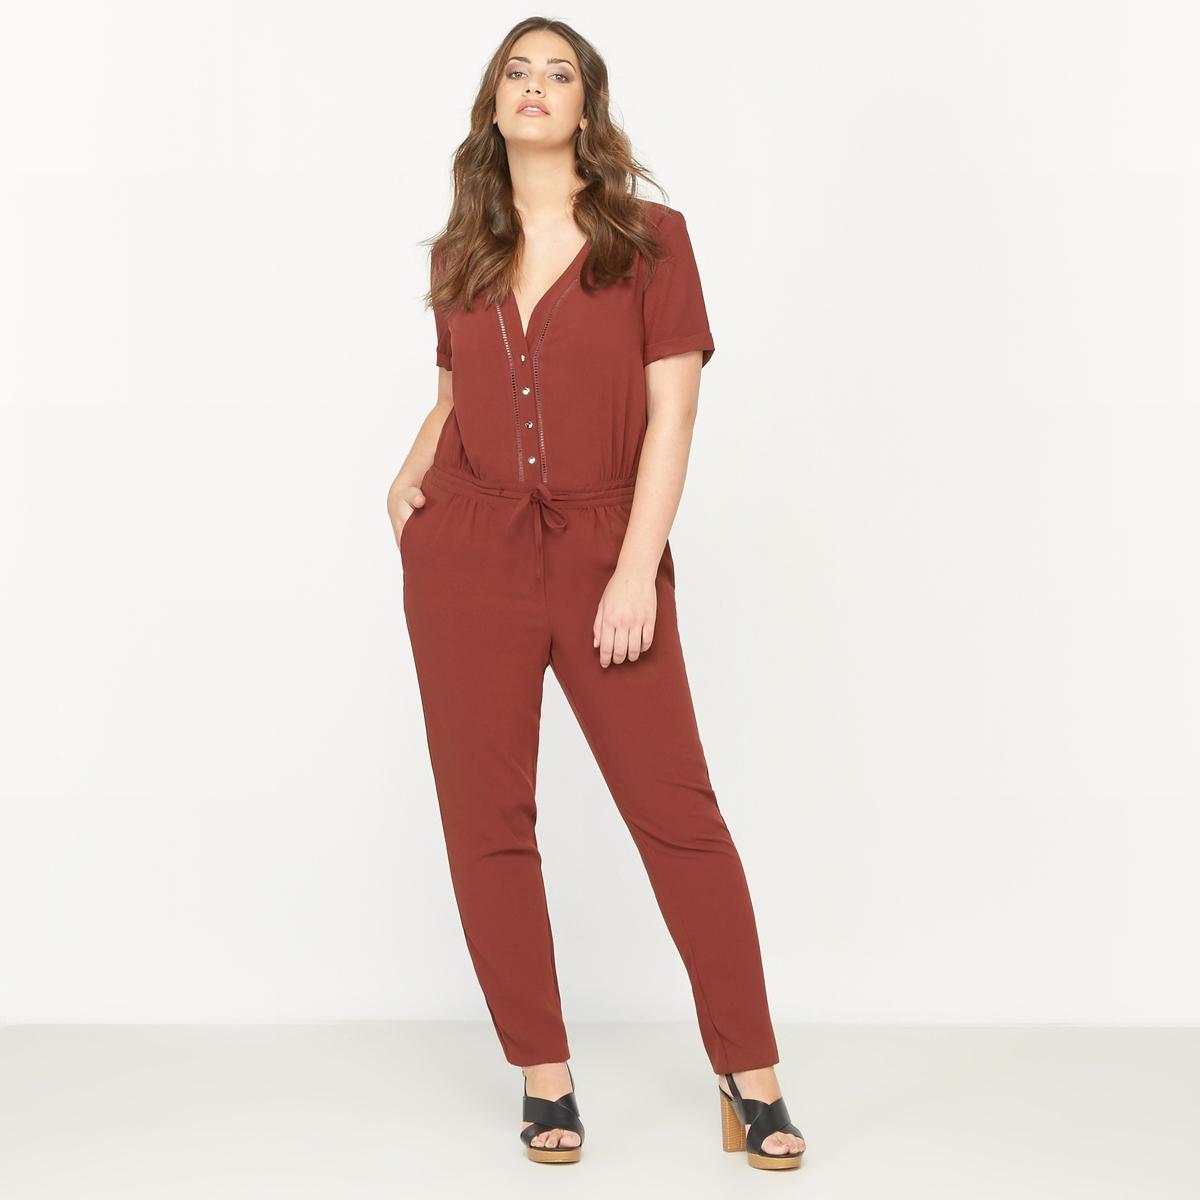 Комбинезон с брюками с короткими рукавами